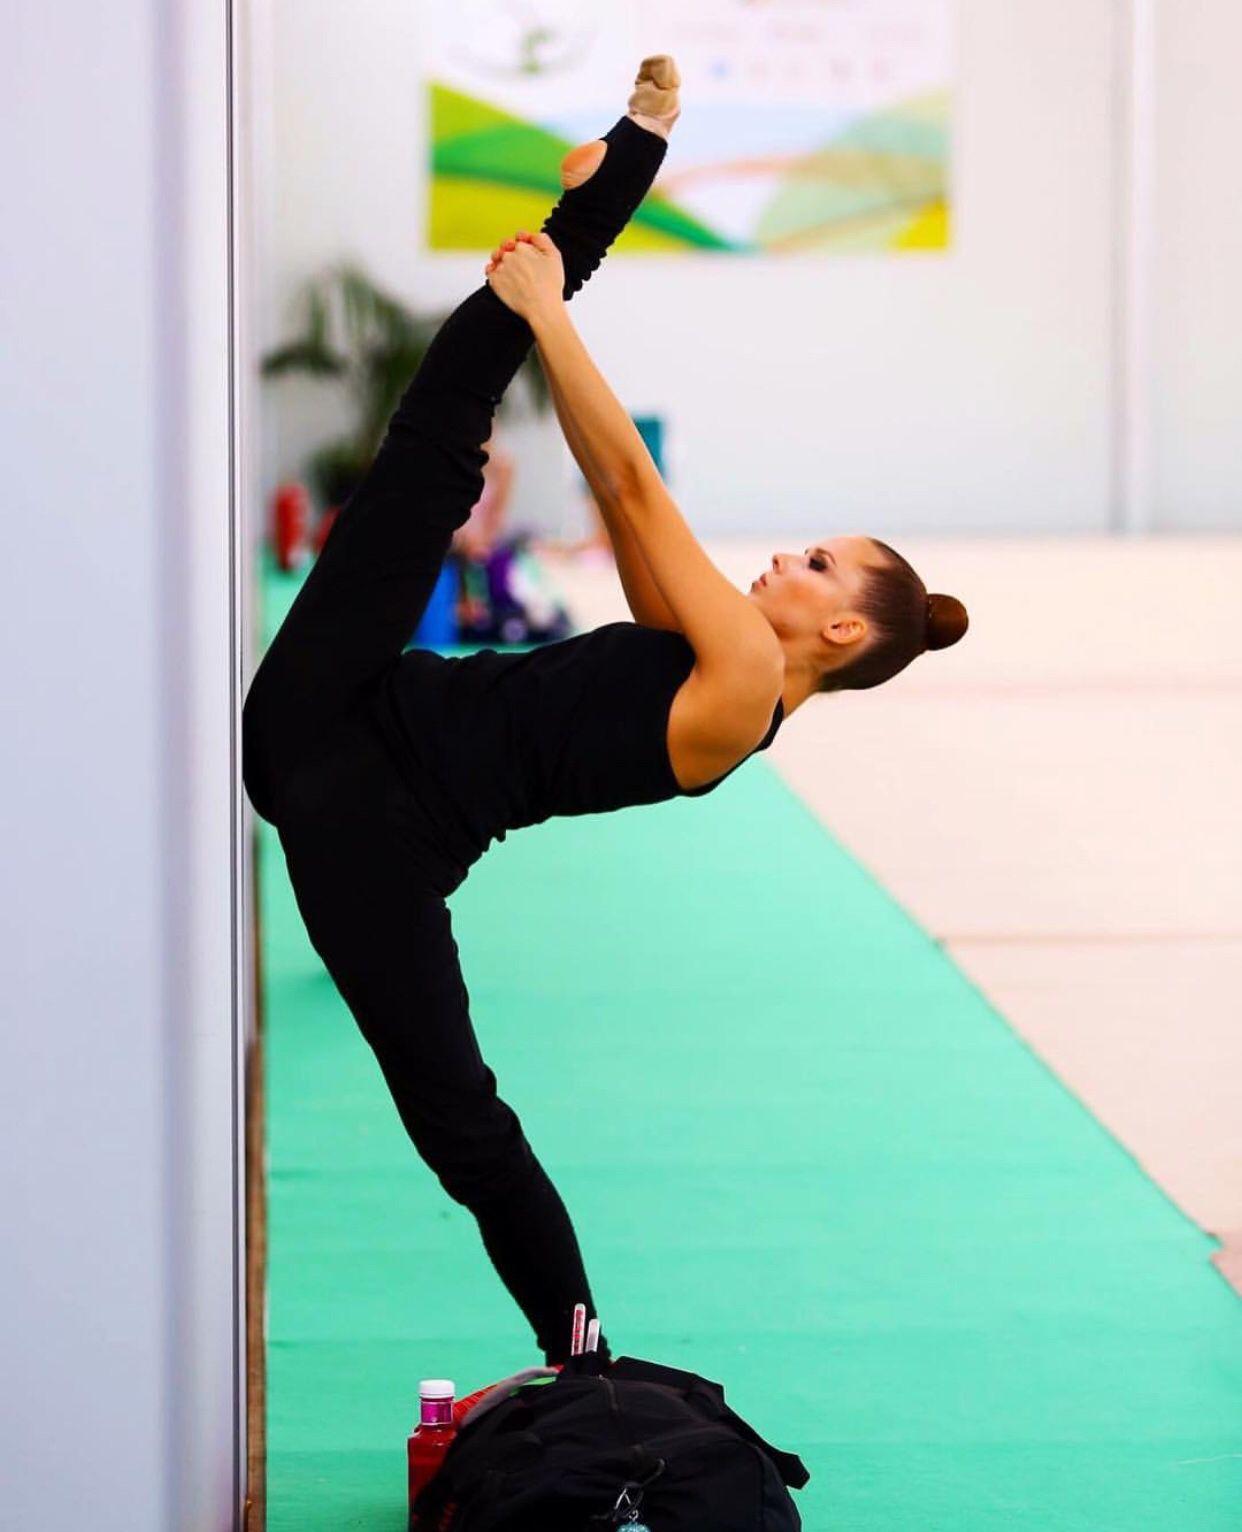 Pin By Yanxxkai On Elegance Dance Flexibility Stretches Acro Dance Gymnastics Poses